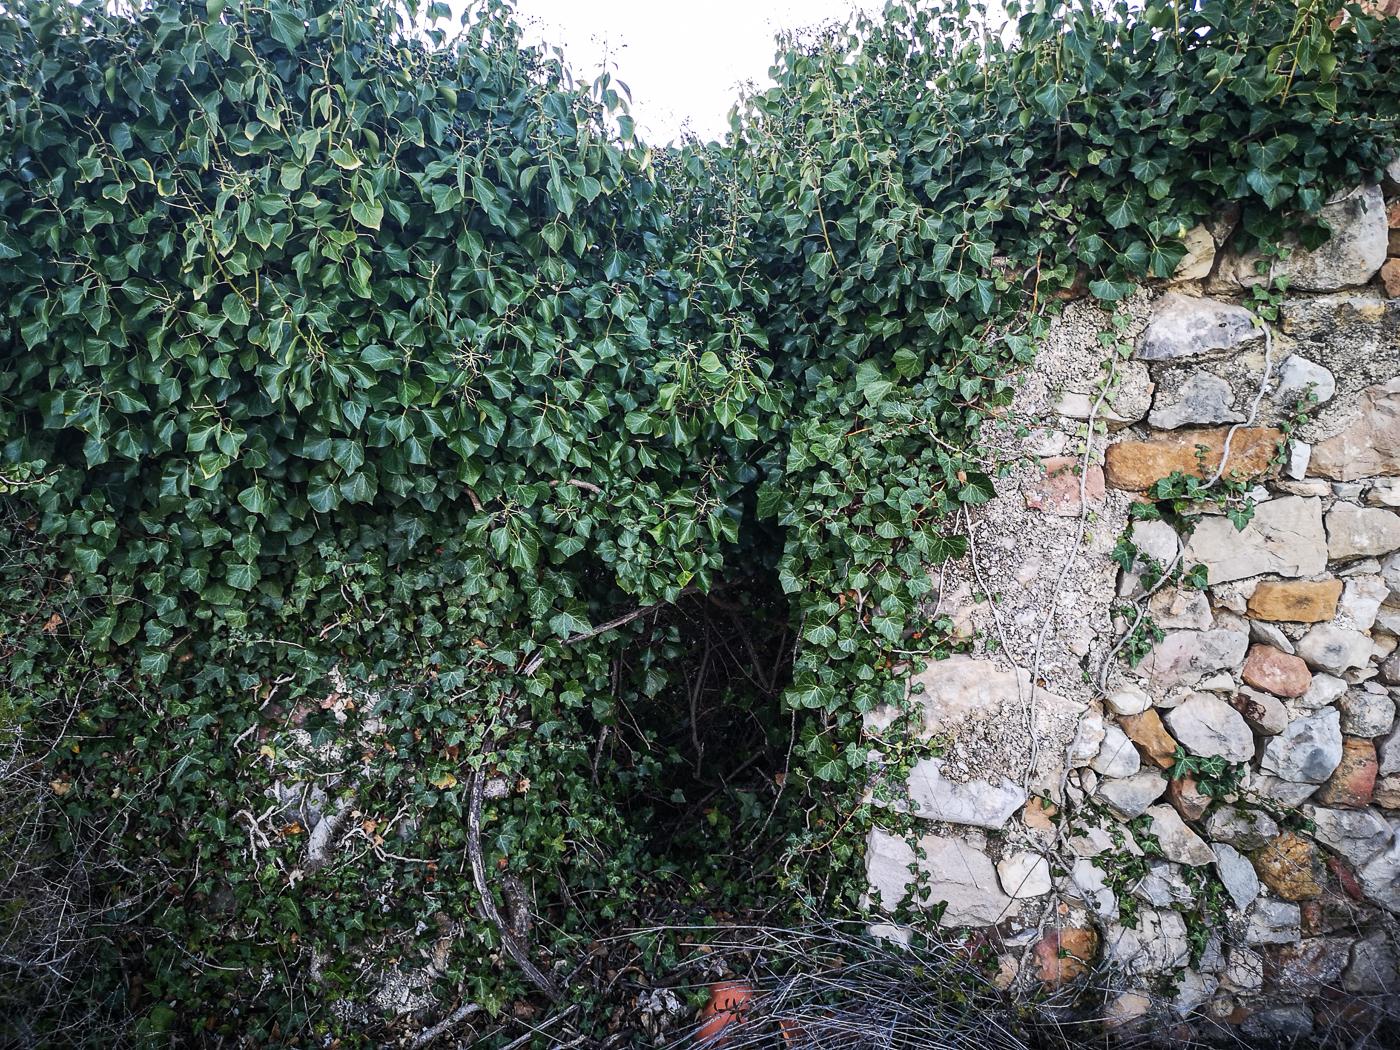 The secret garden had transformed itself into a cornucopia of weeds